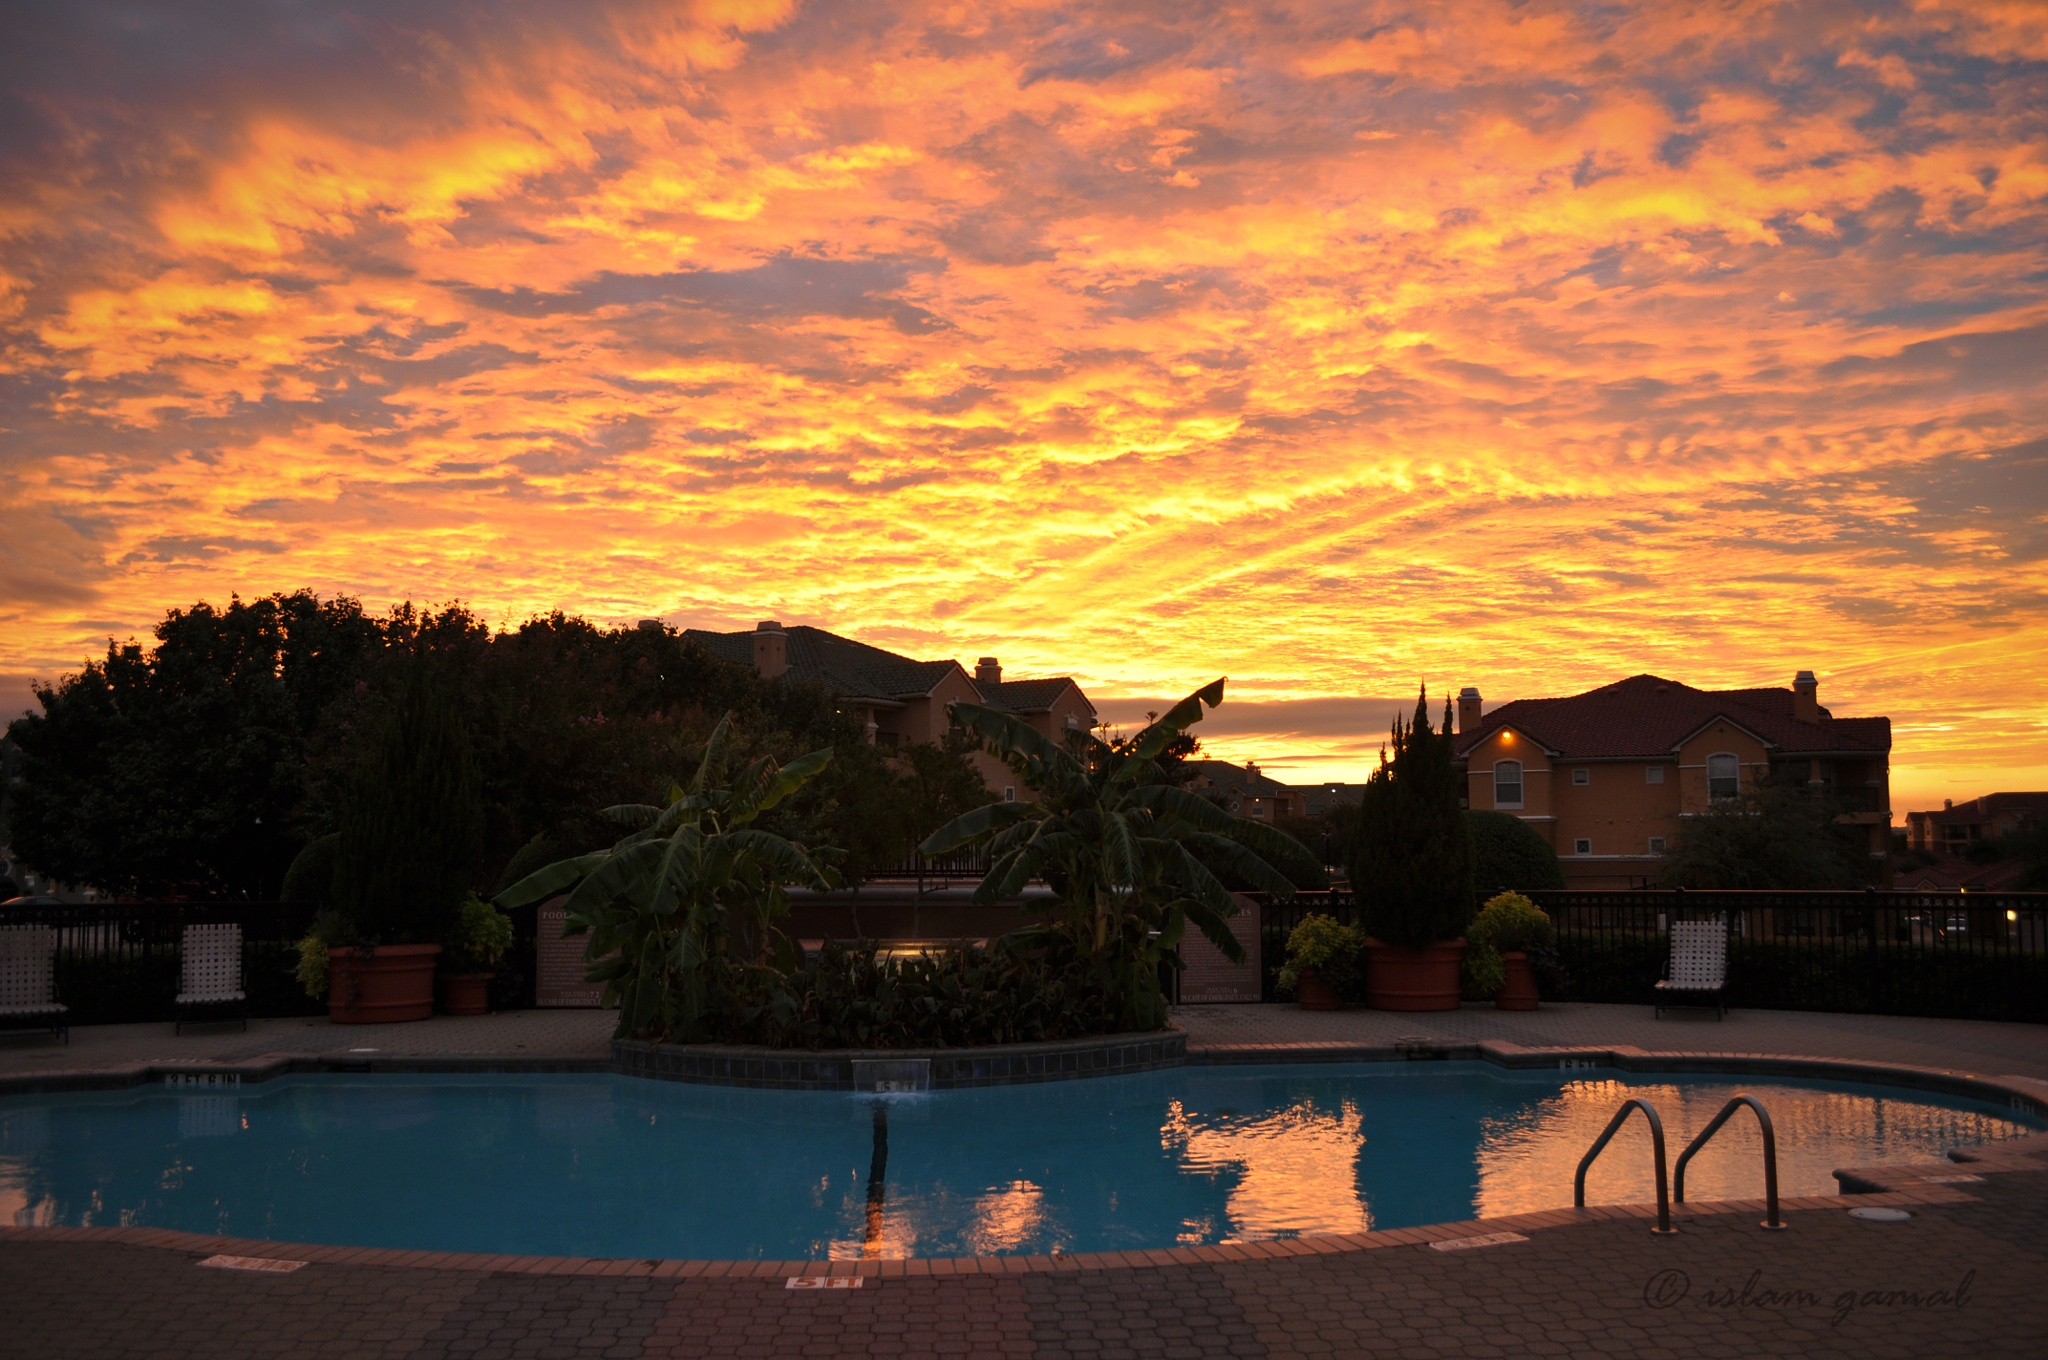 sky over texas by searock78